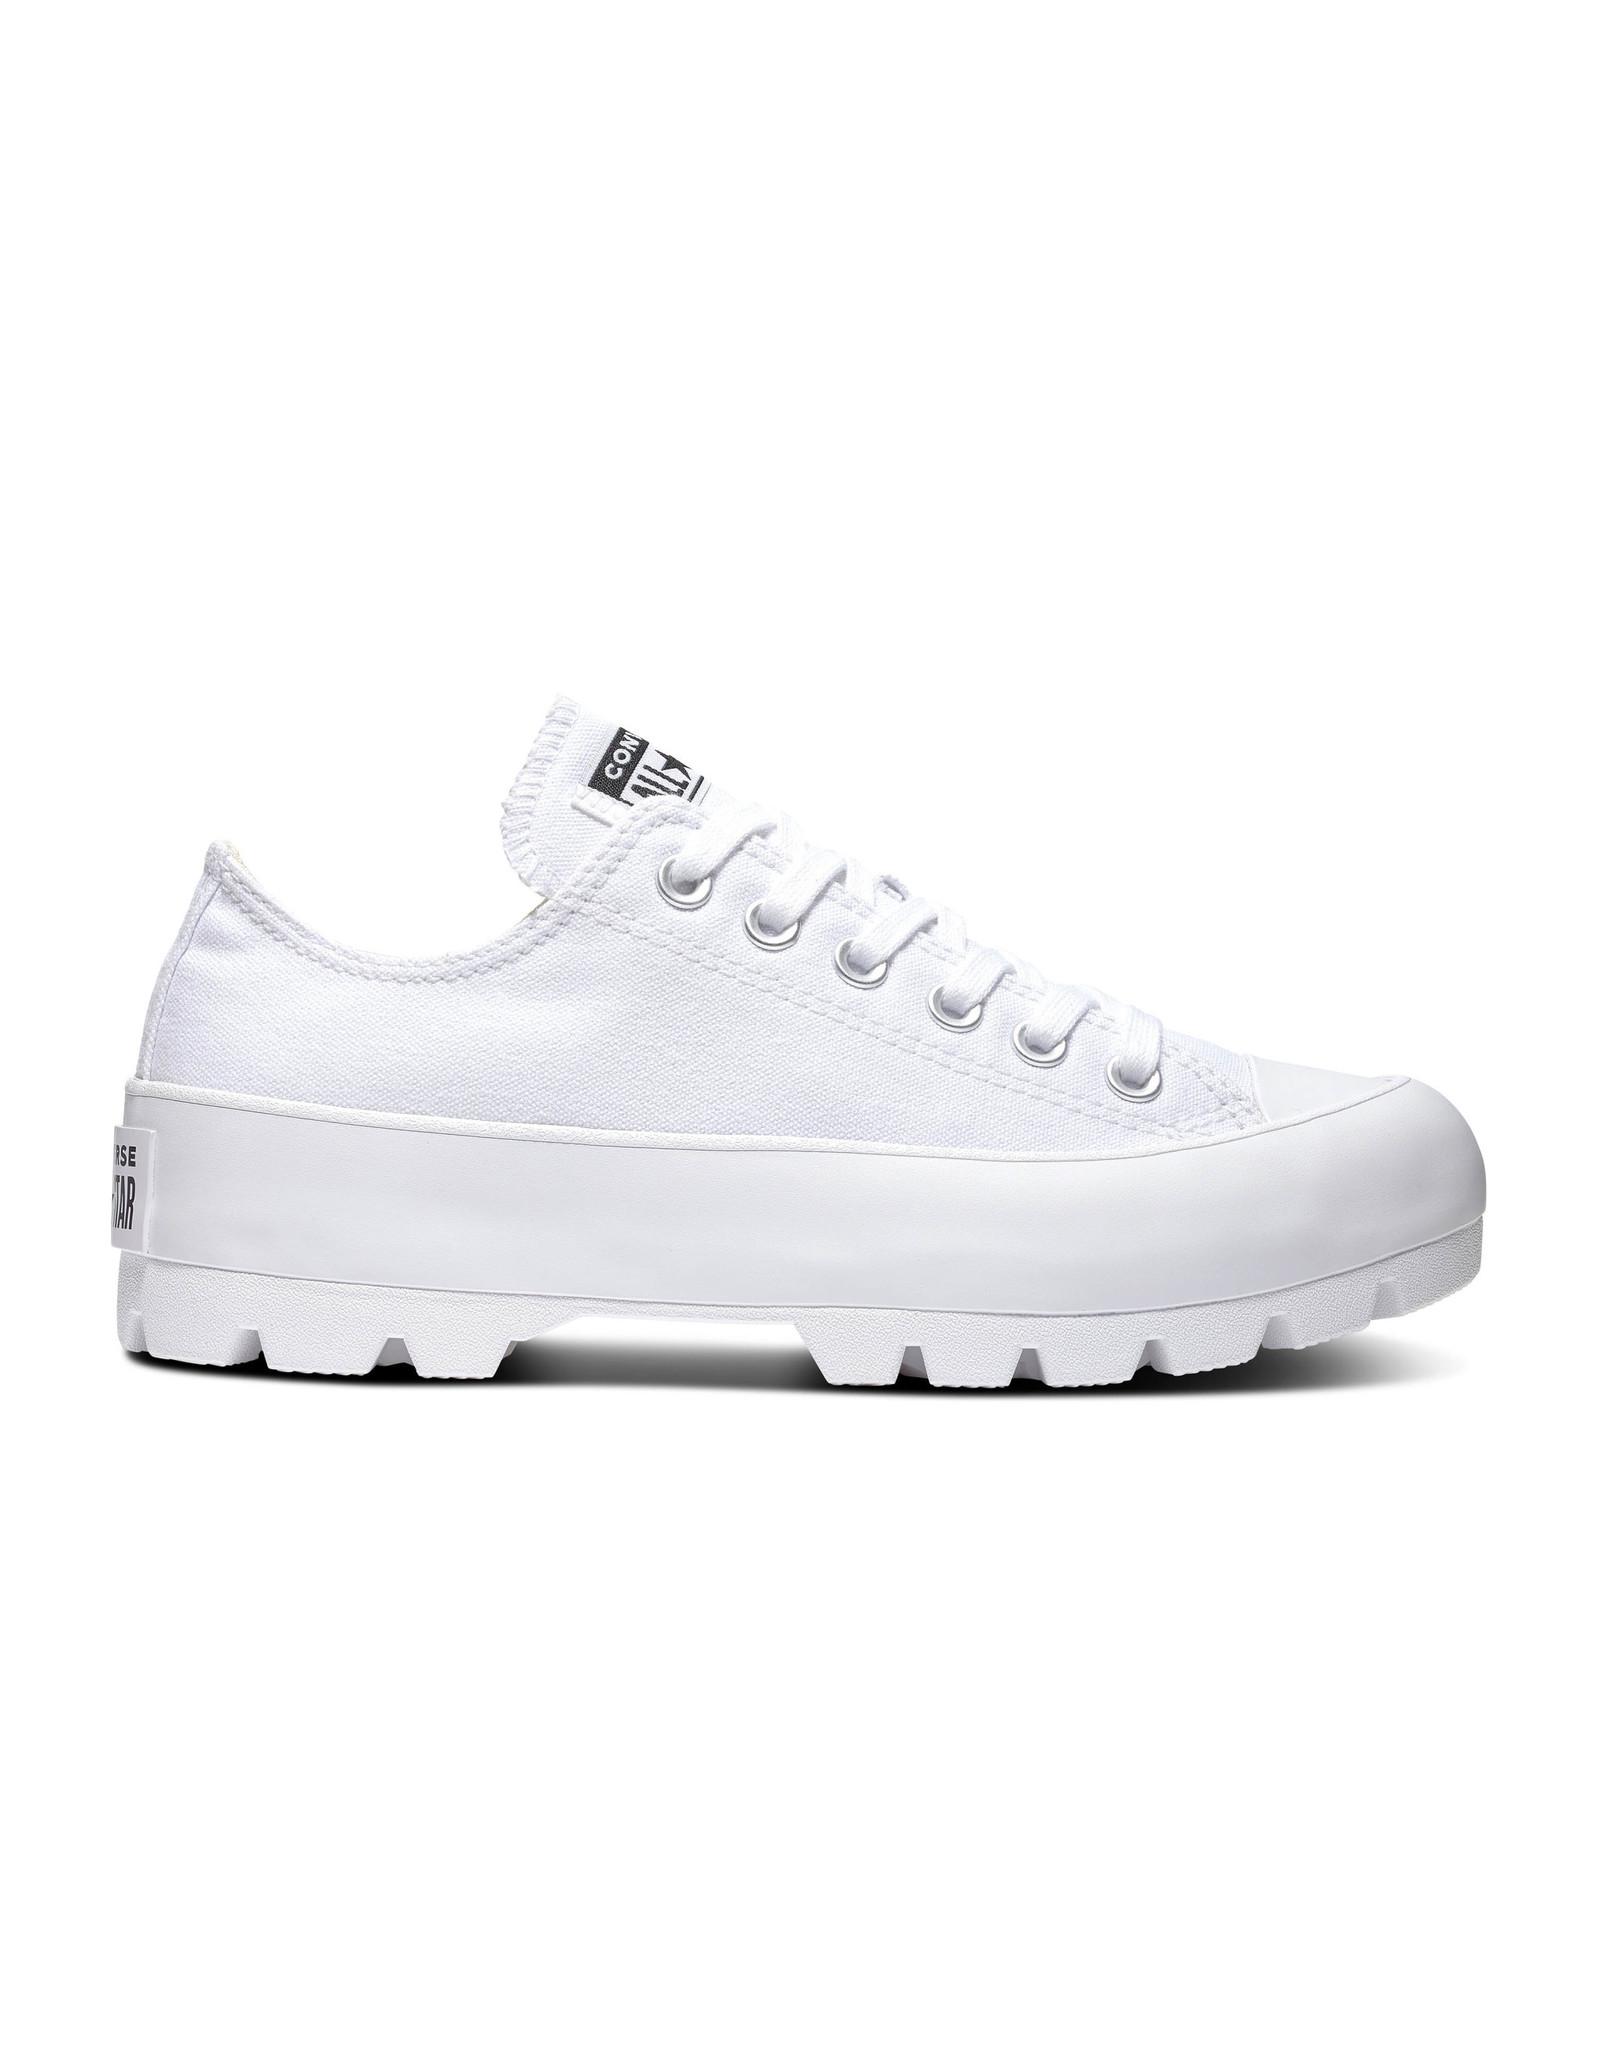 CONVERSE CHUCK TAYLOR LUGGED OX WHITE/WHITE/WHITE C094WX-567680C